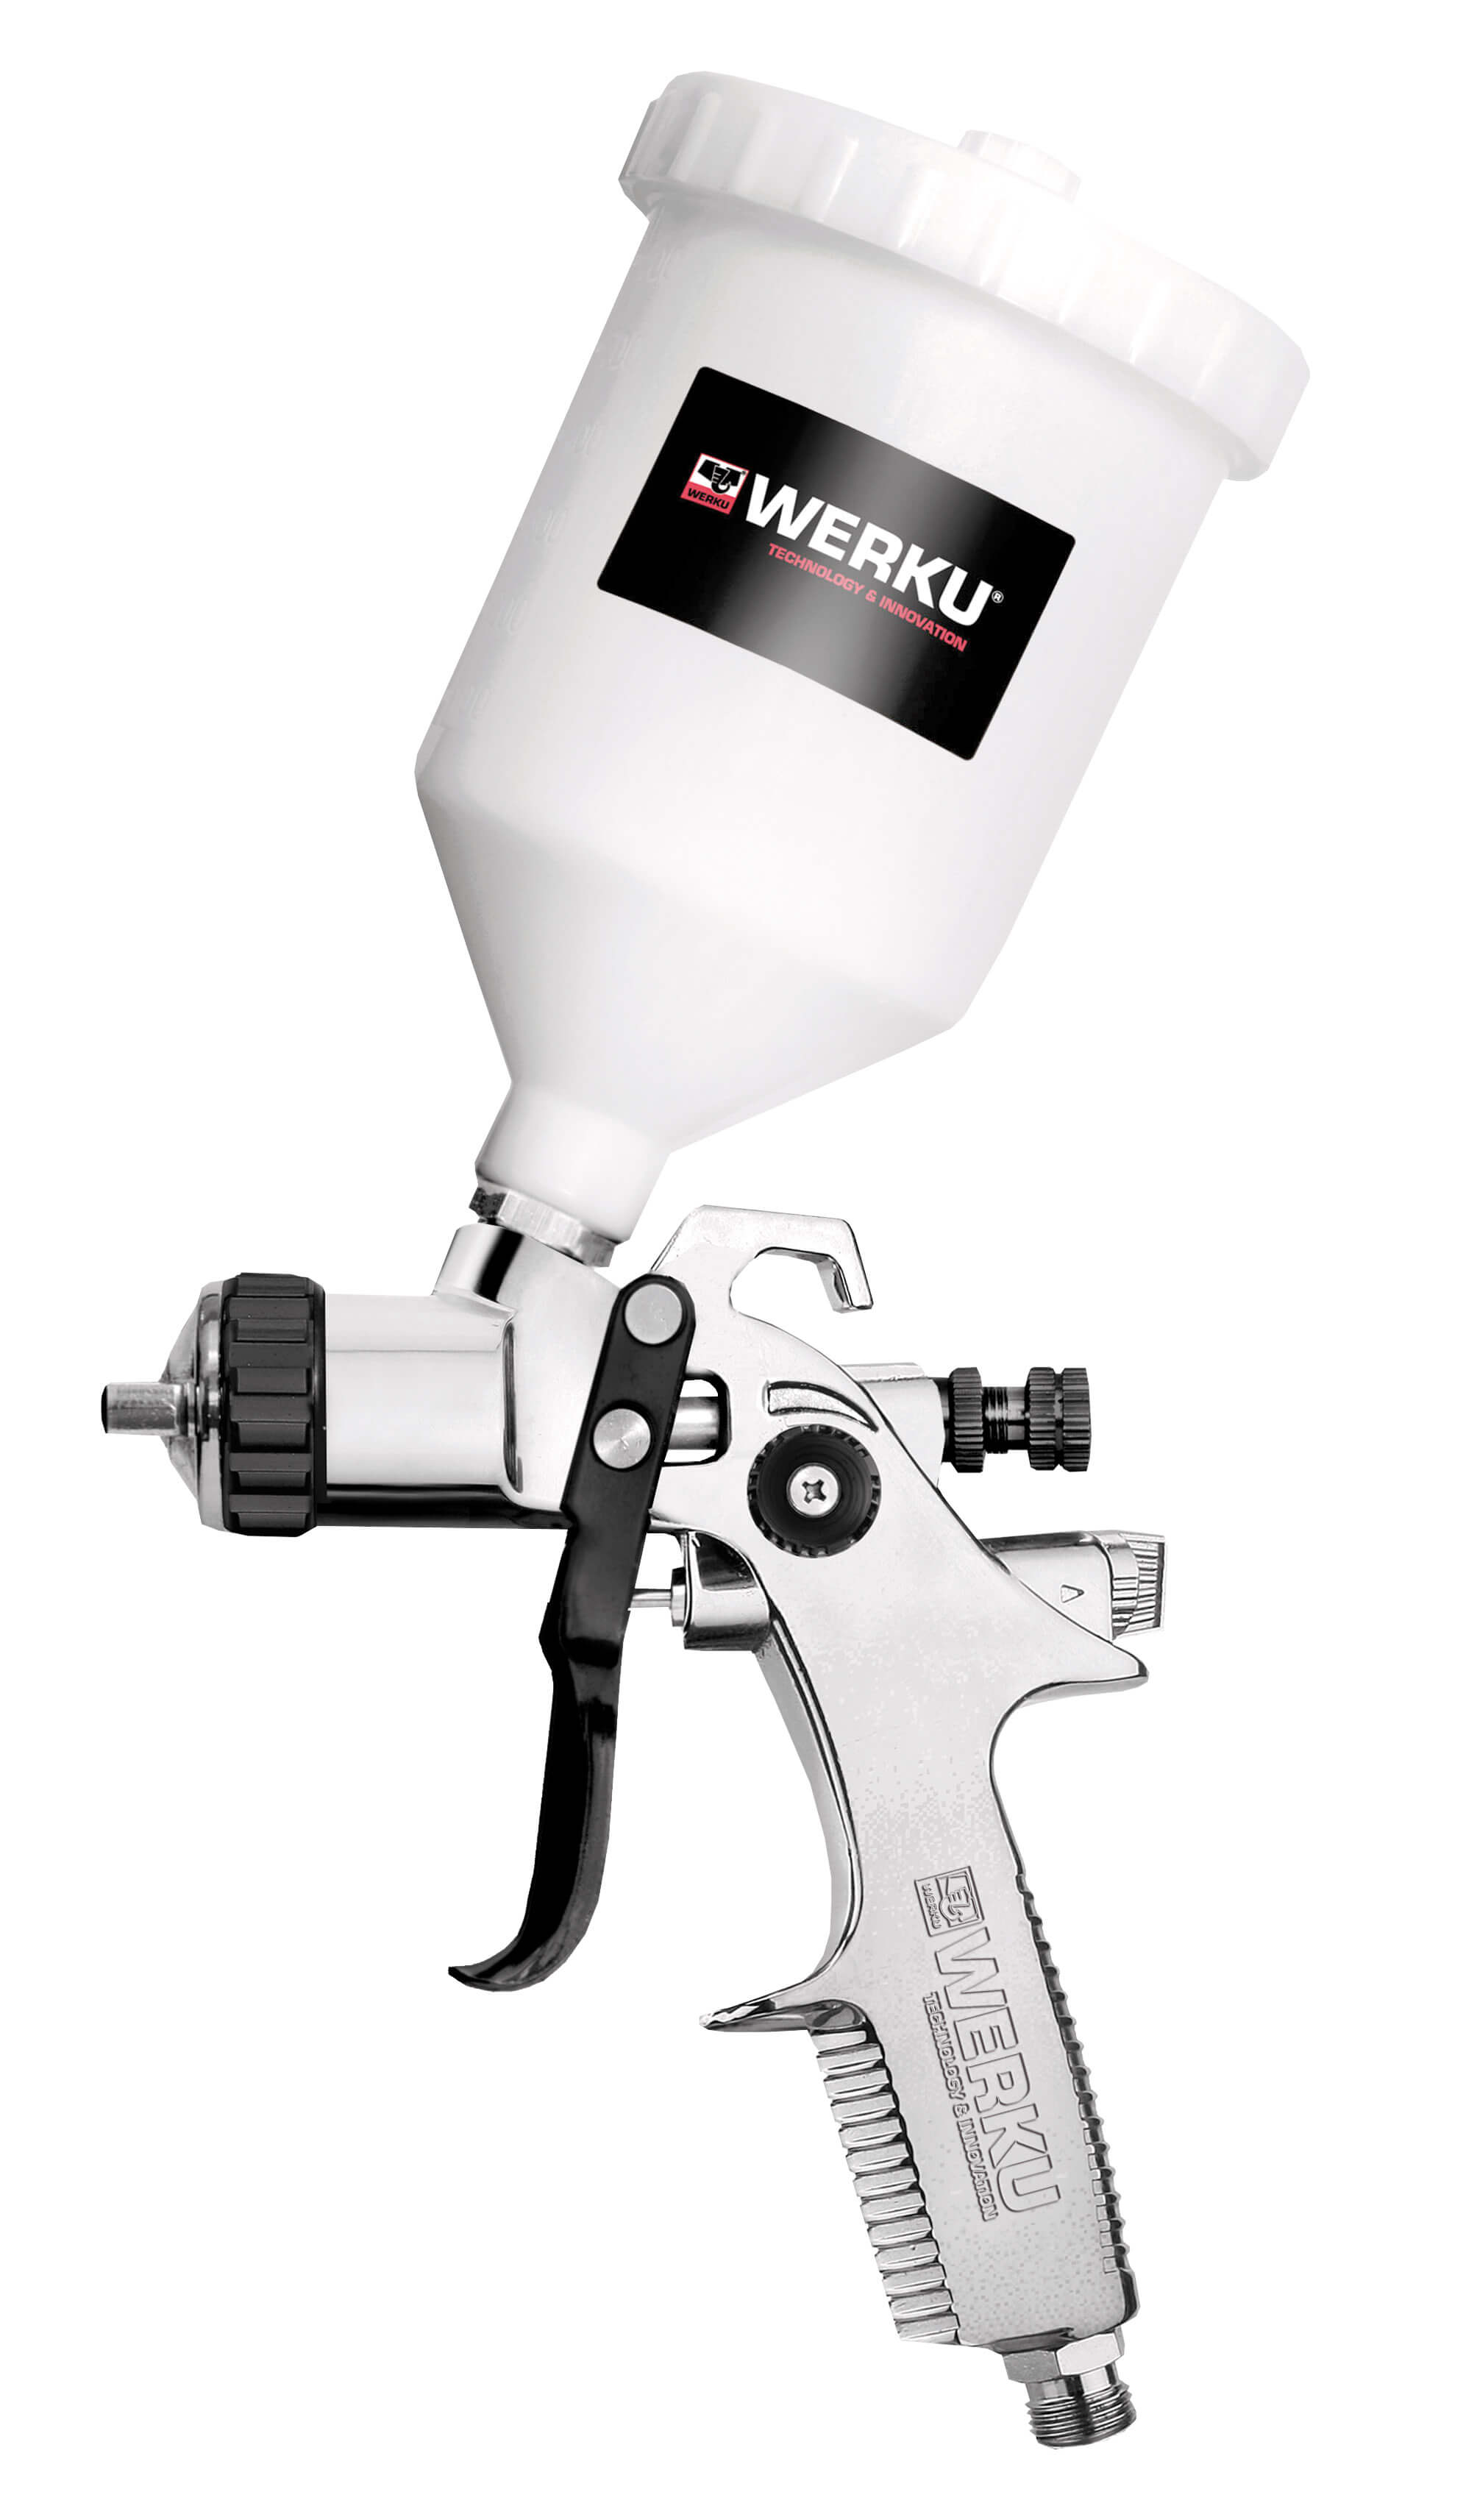 Pistola para pintar gravedad compra online facil de usar - Pistola de pintar ...